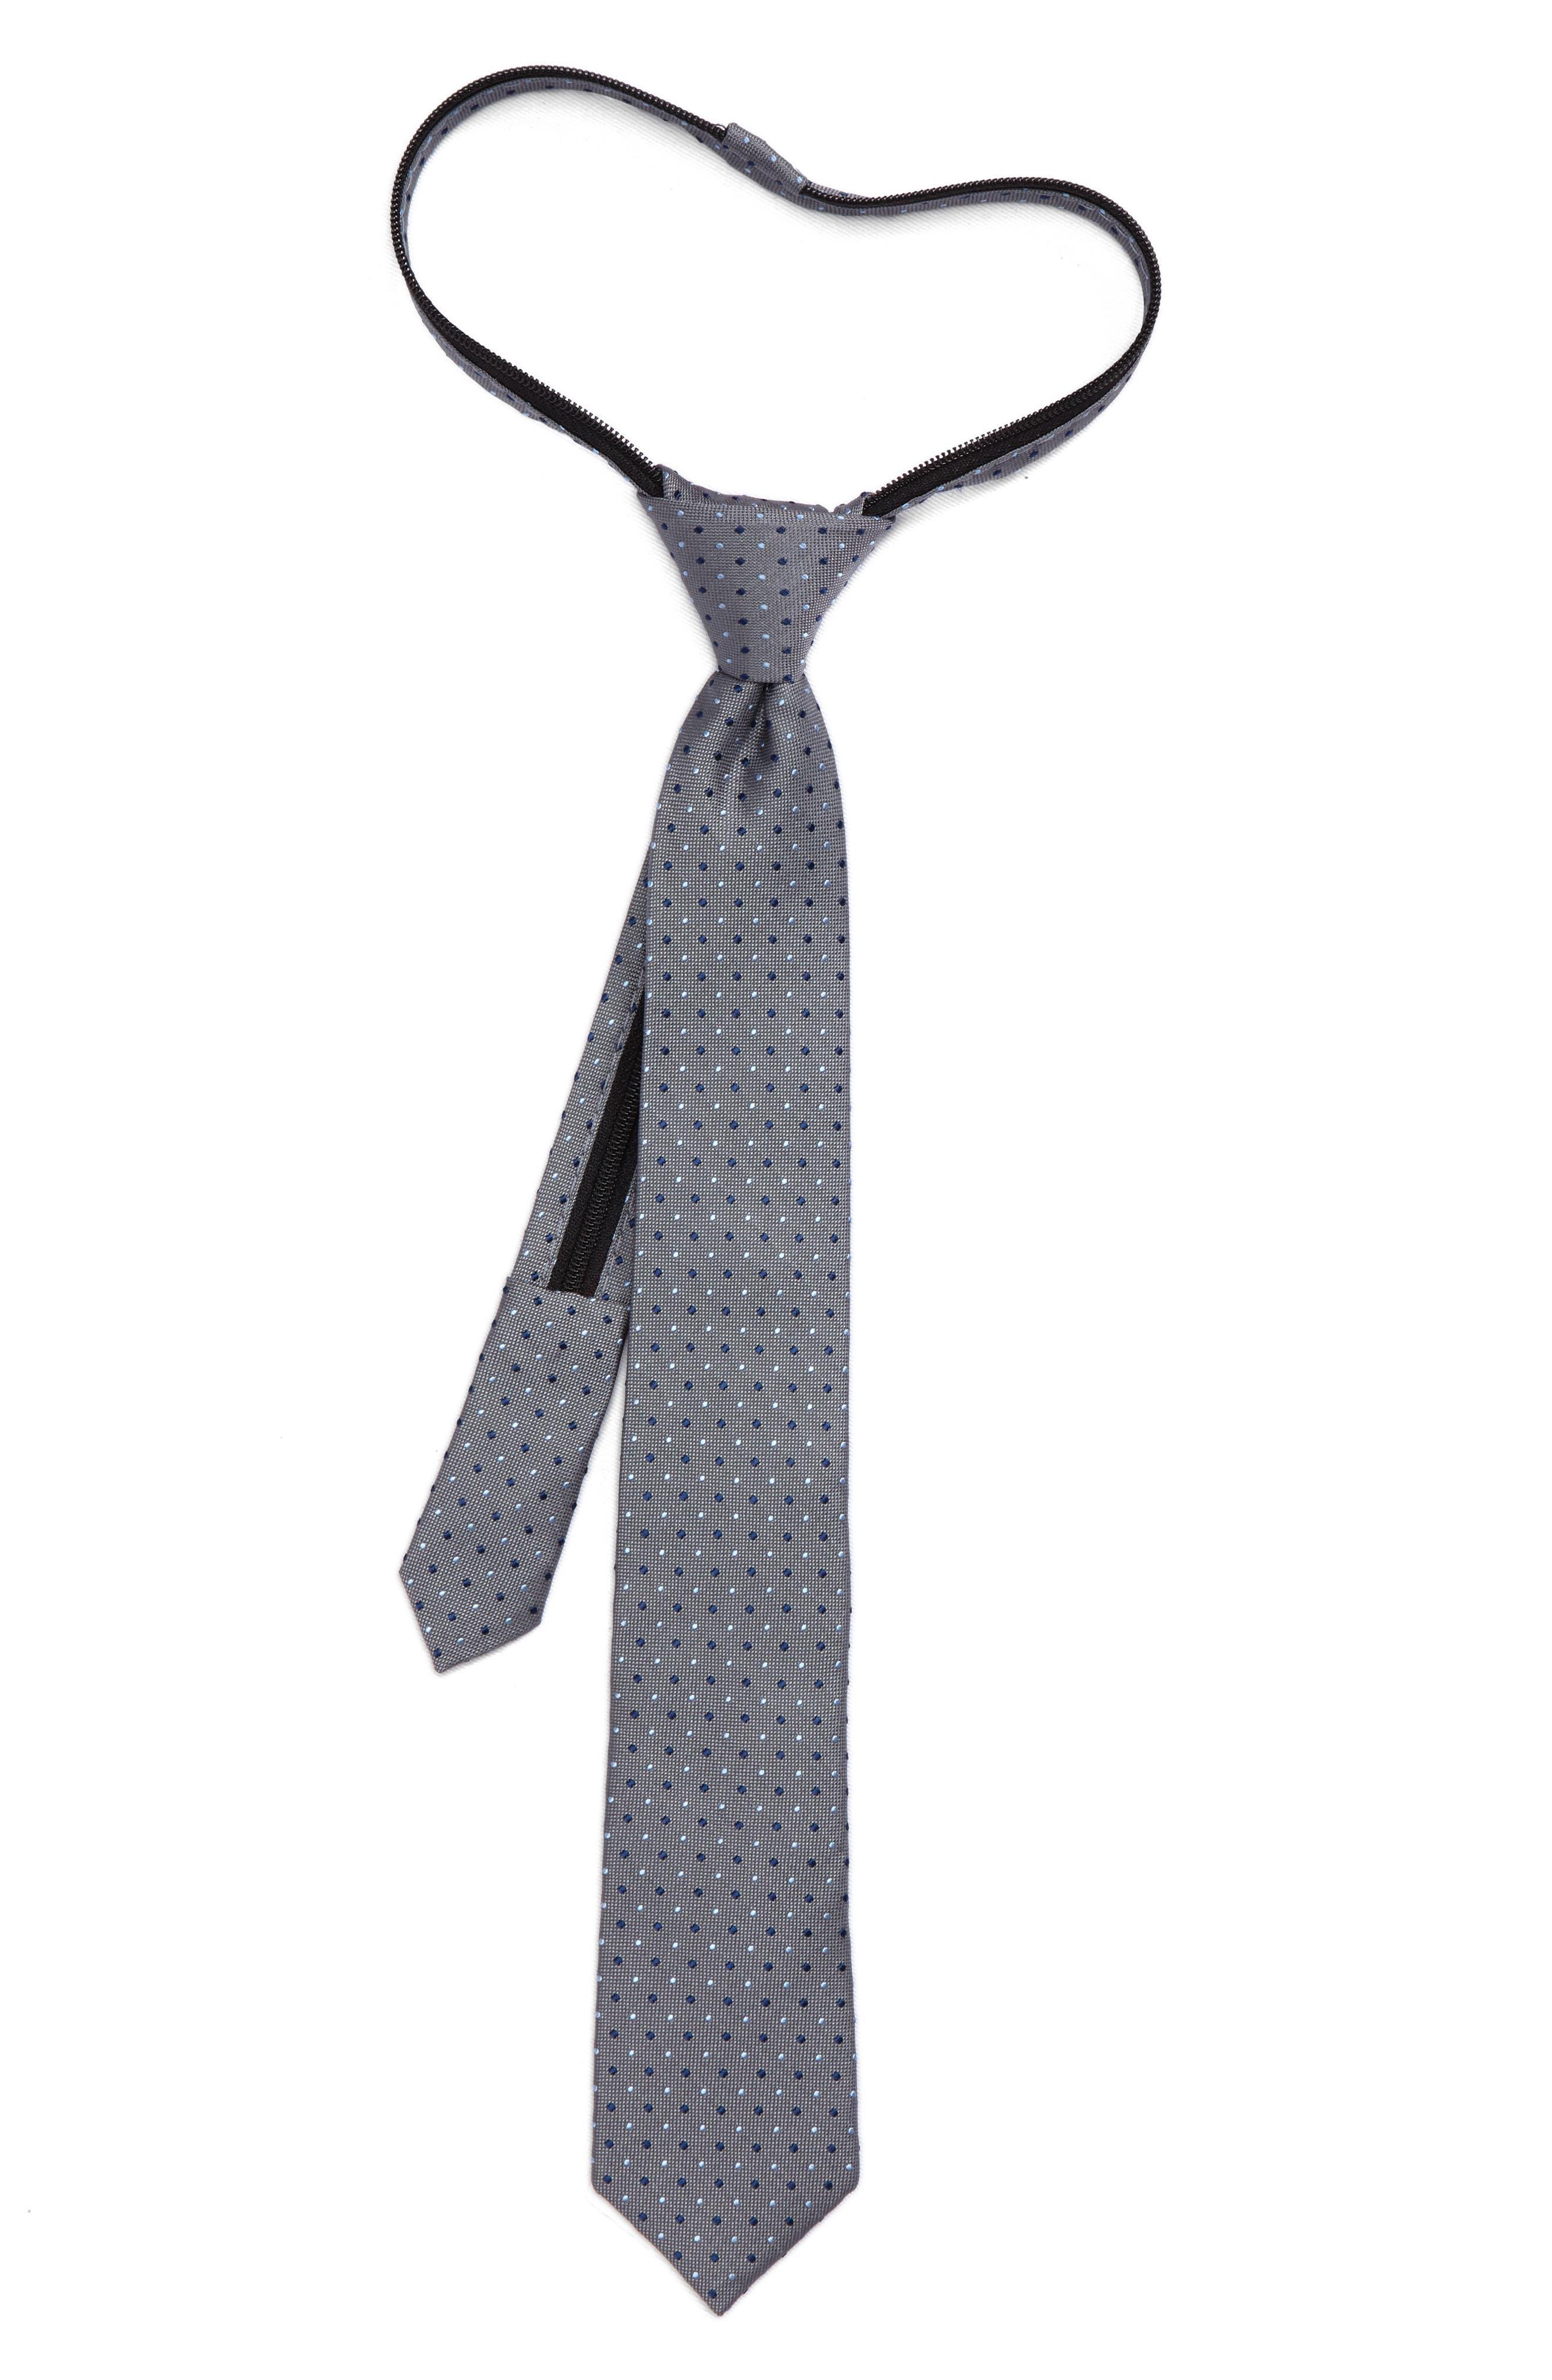 Alternate Image 1 Selected - Nordstrom Dot Silk Zip Tie (Boys)